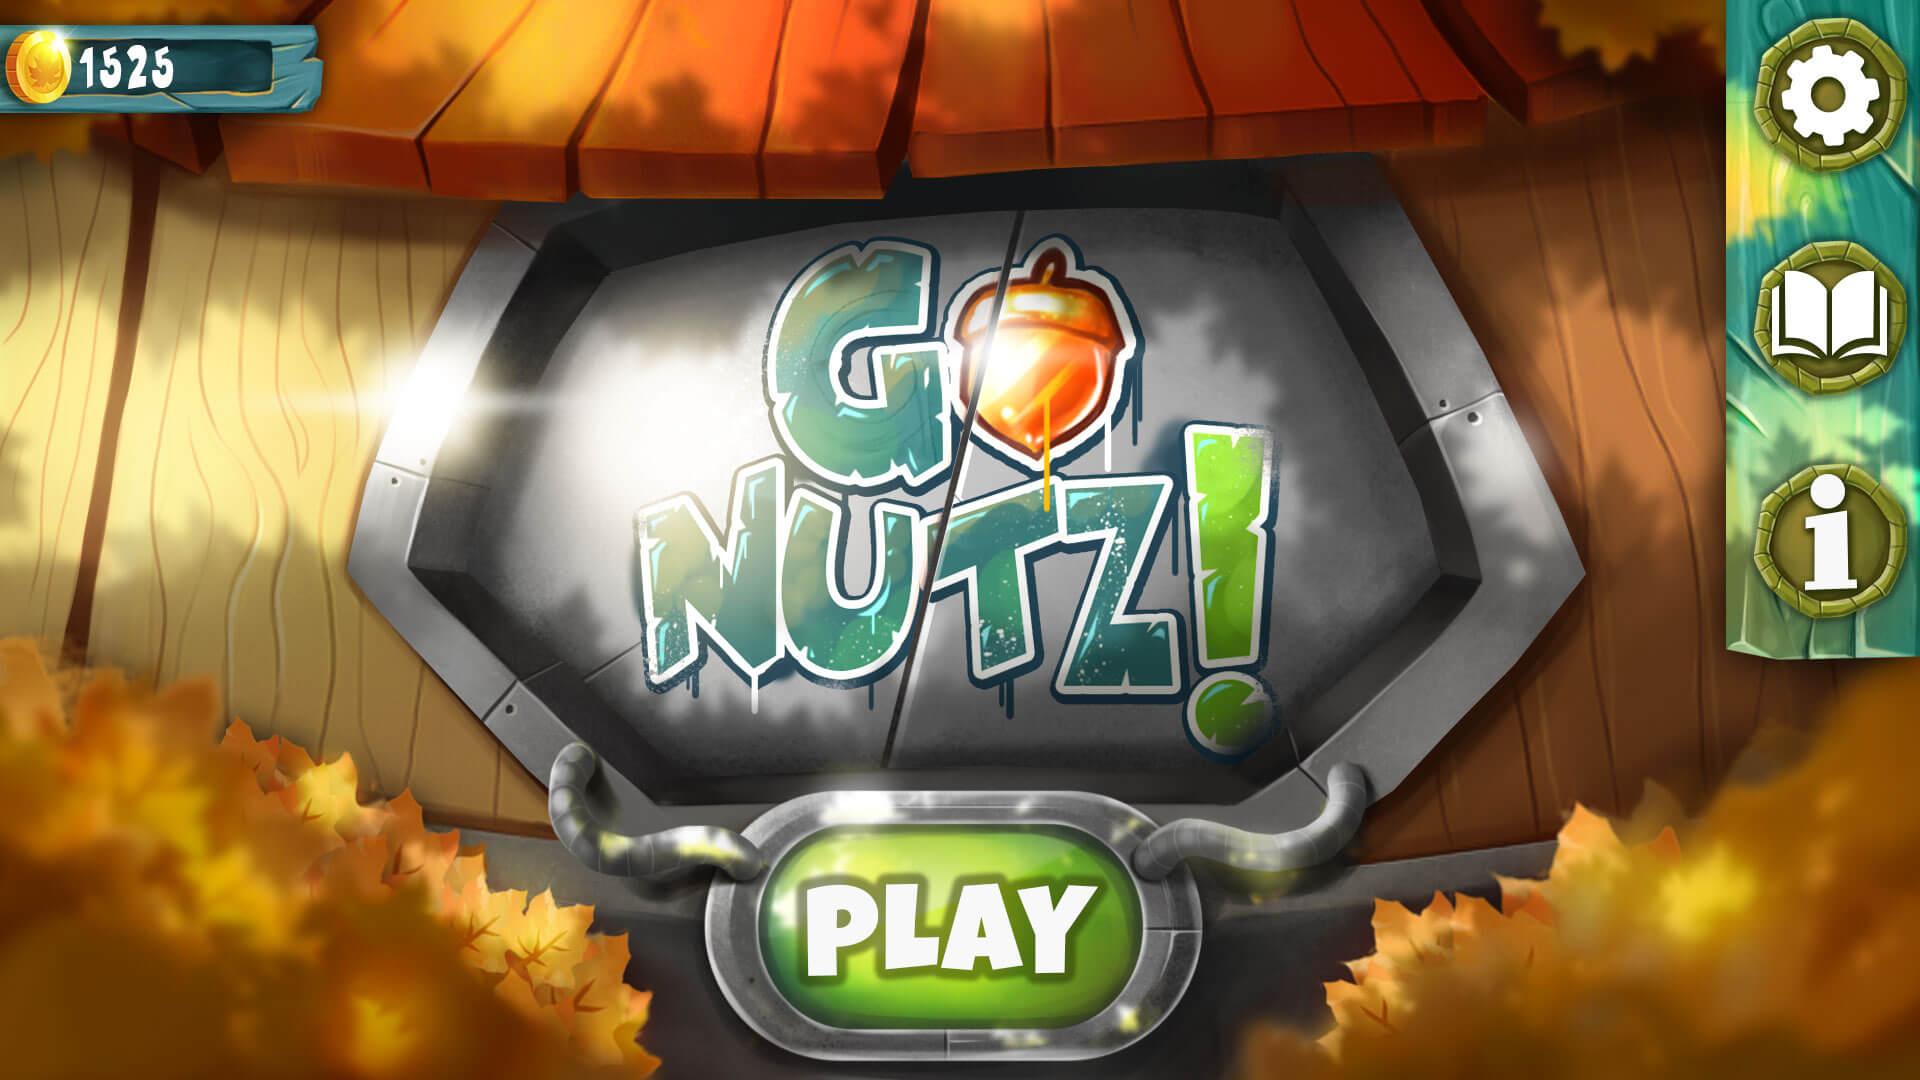 Go Nutz Game